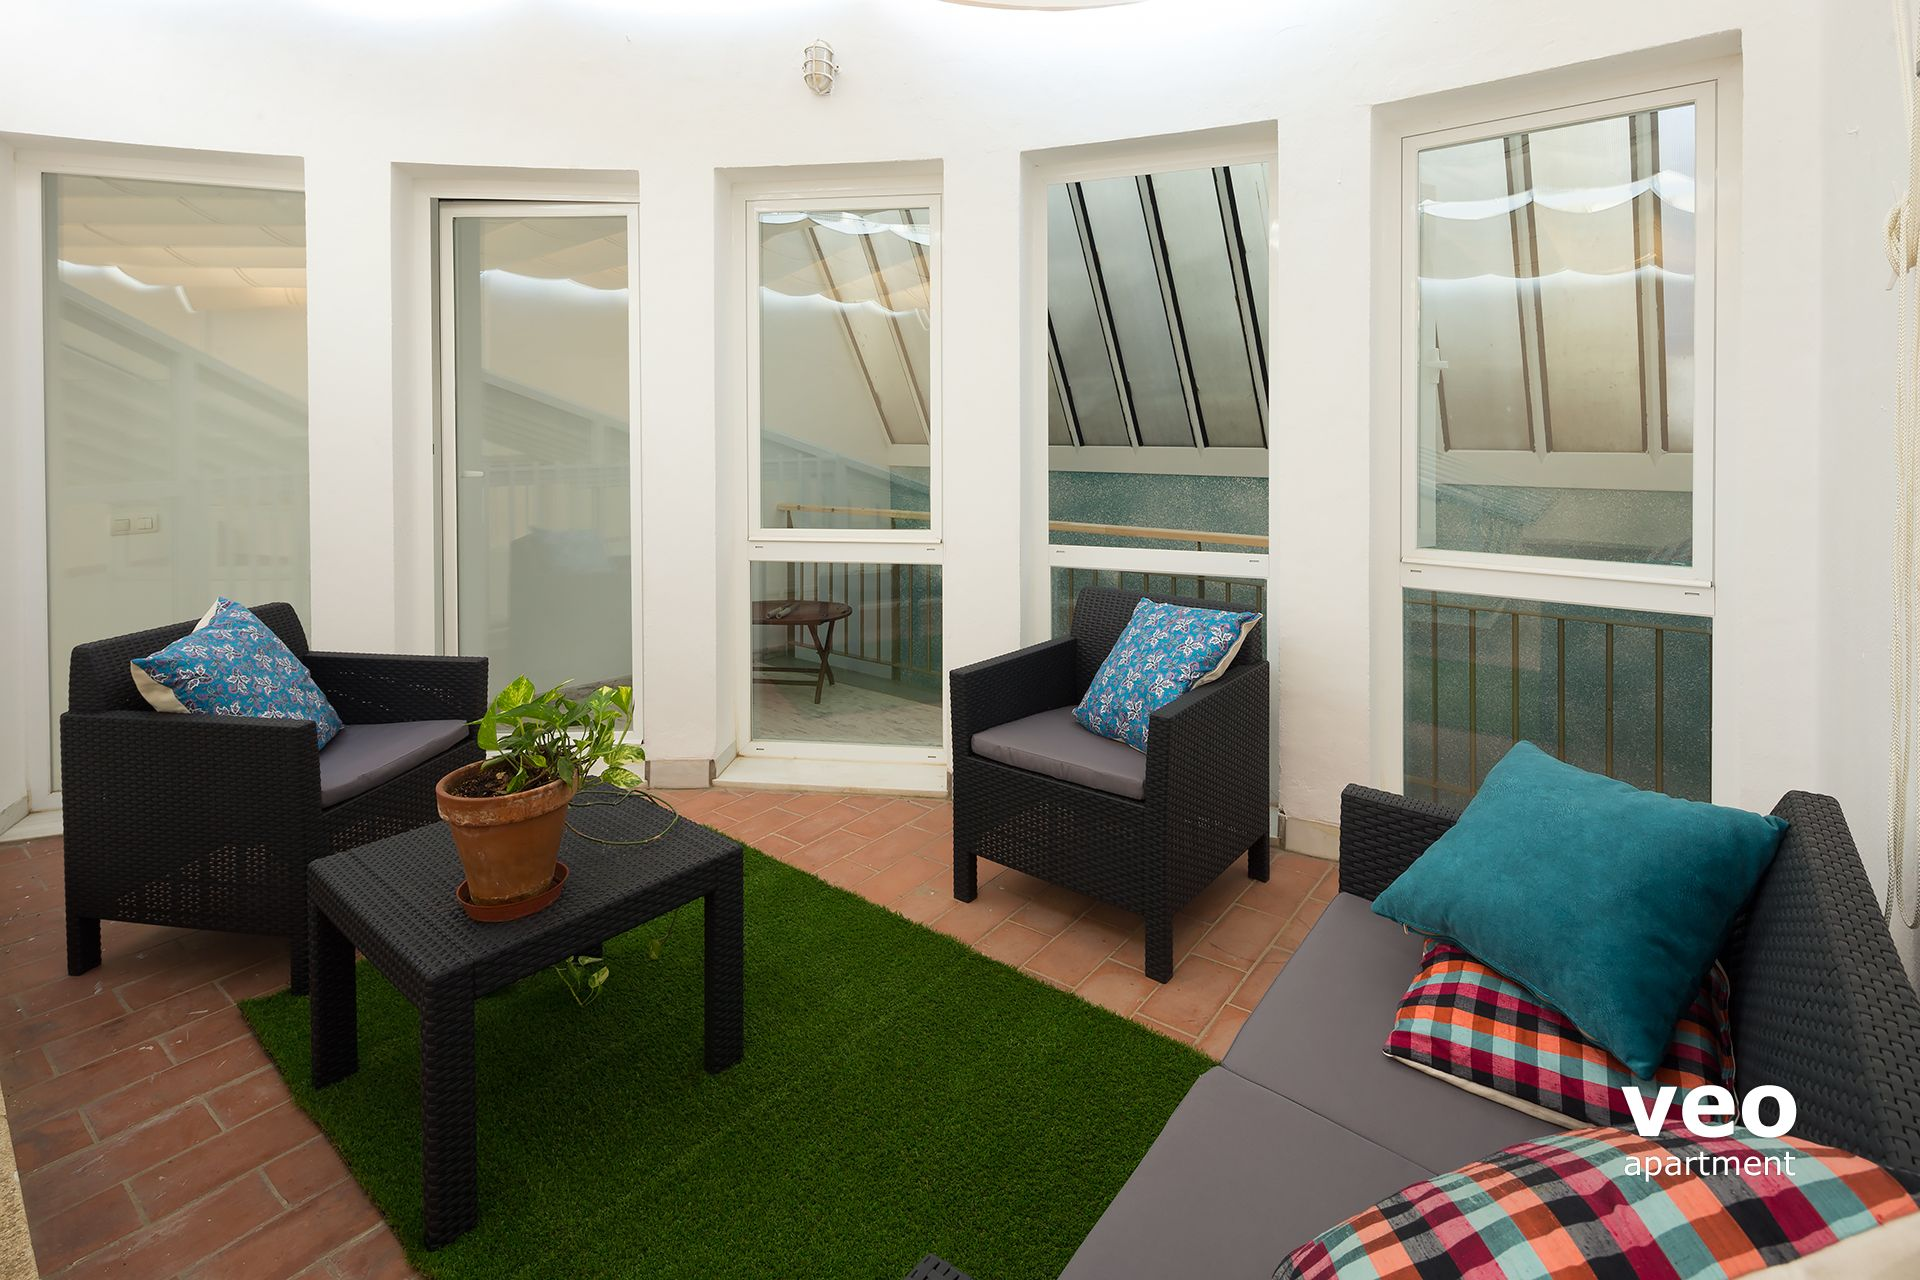 Granada Apartment   Terrace With Outdoor Furniture.